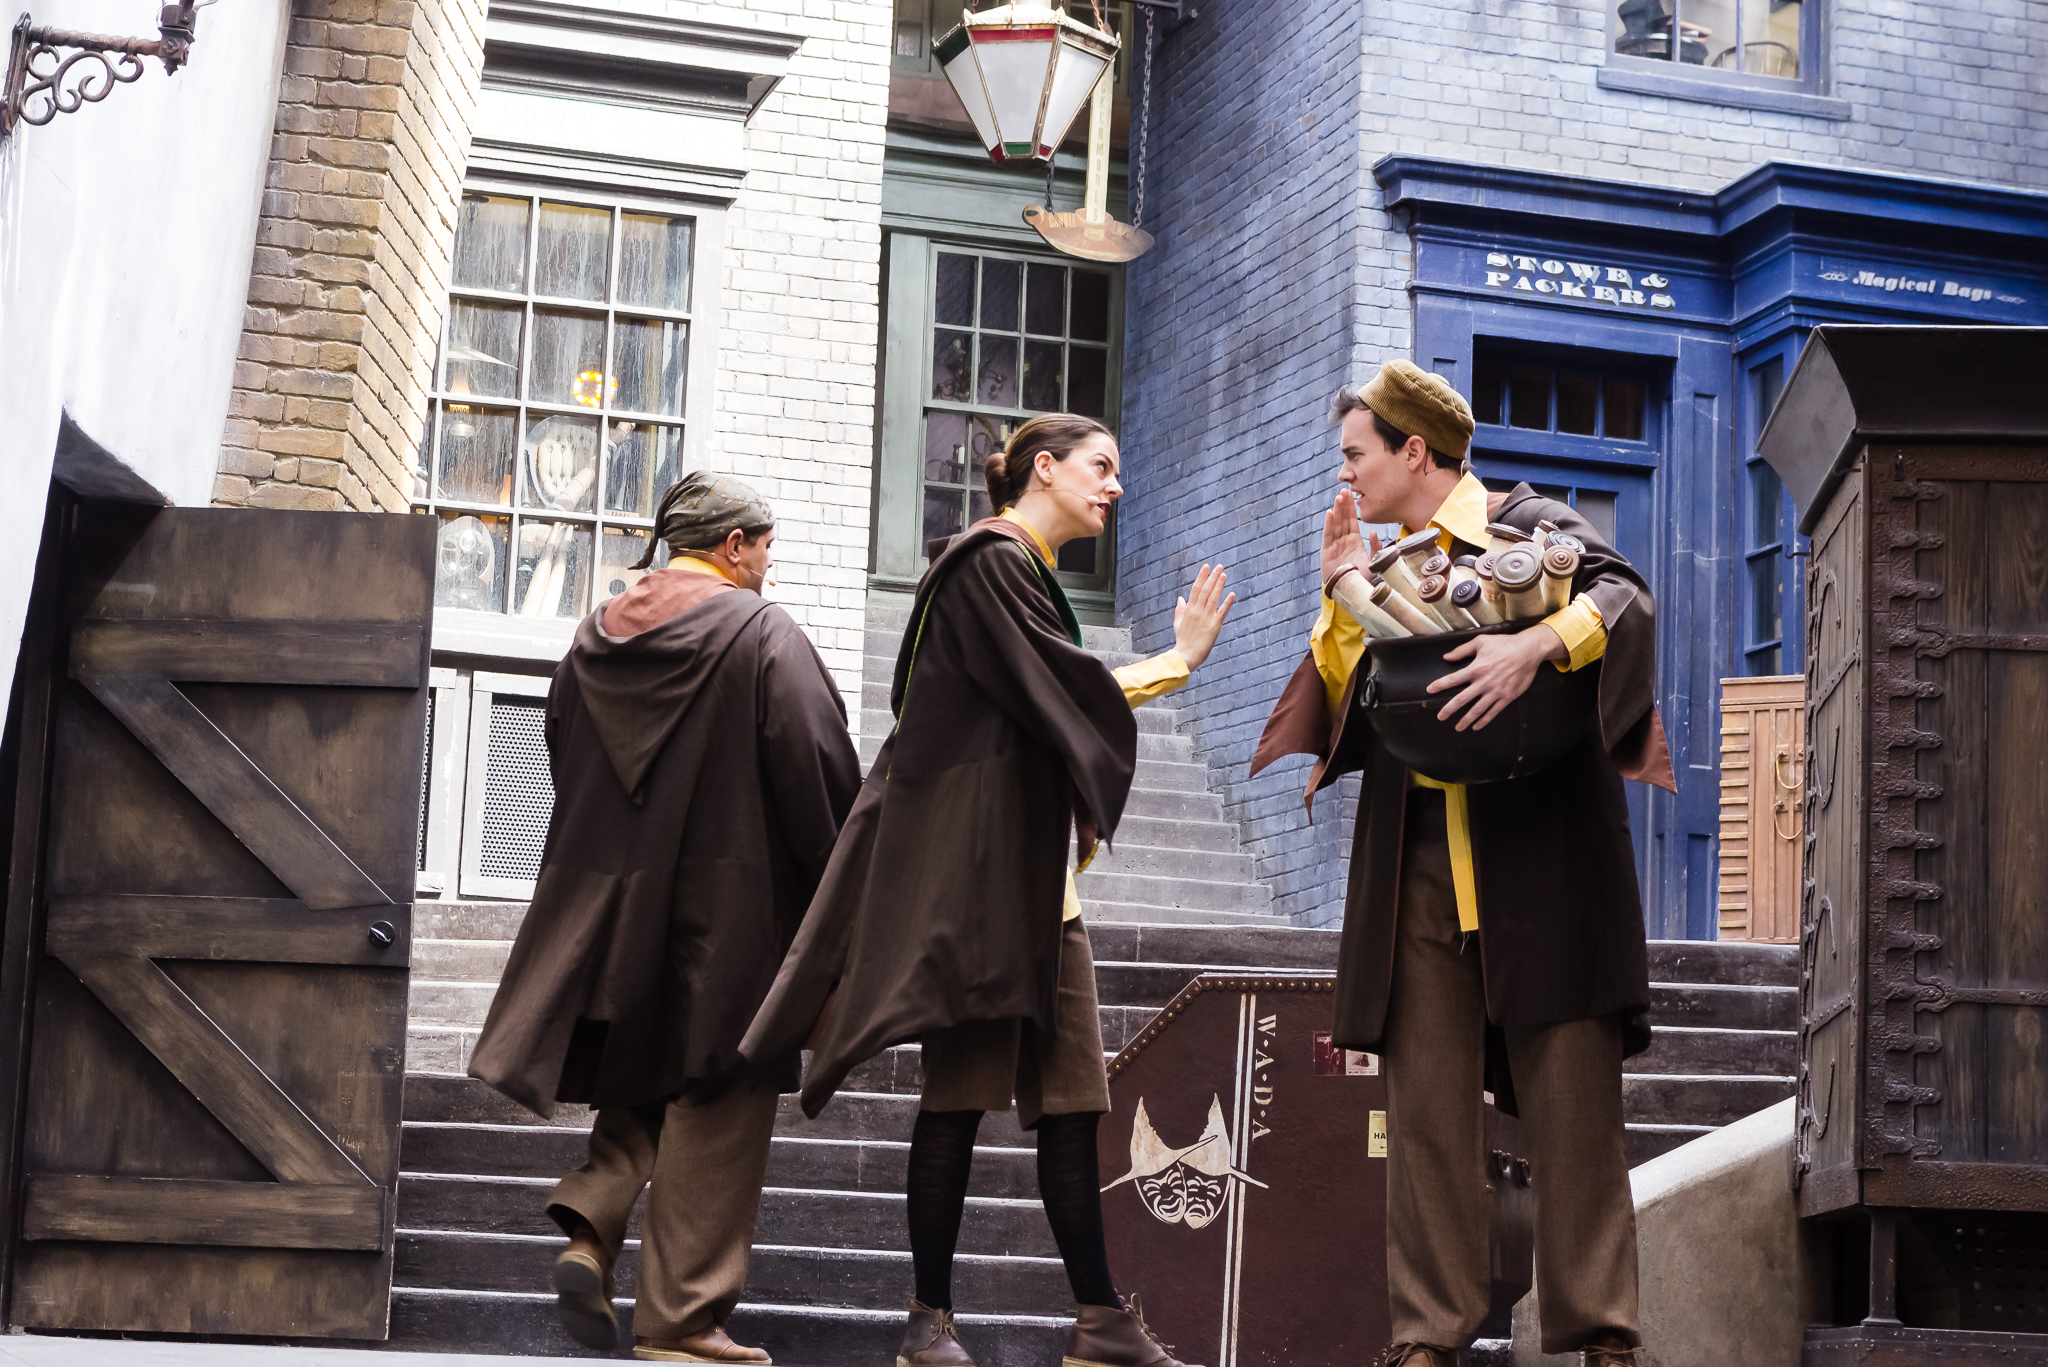 WADA actors storytelling. / 3/5/16 / Universal Studios / Orlando, FL